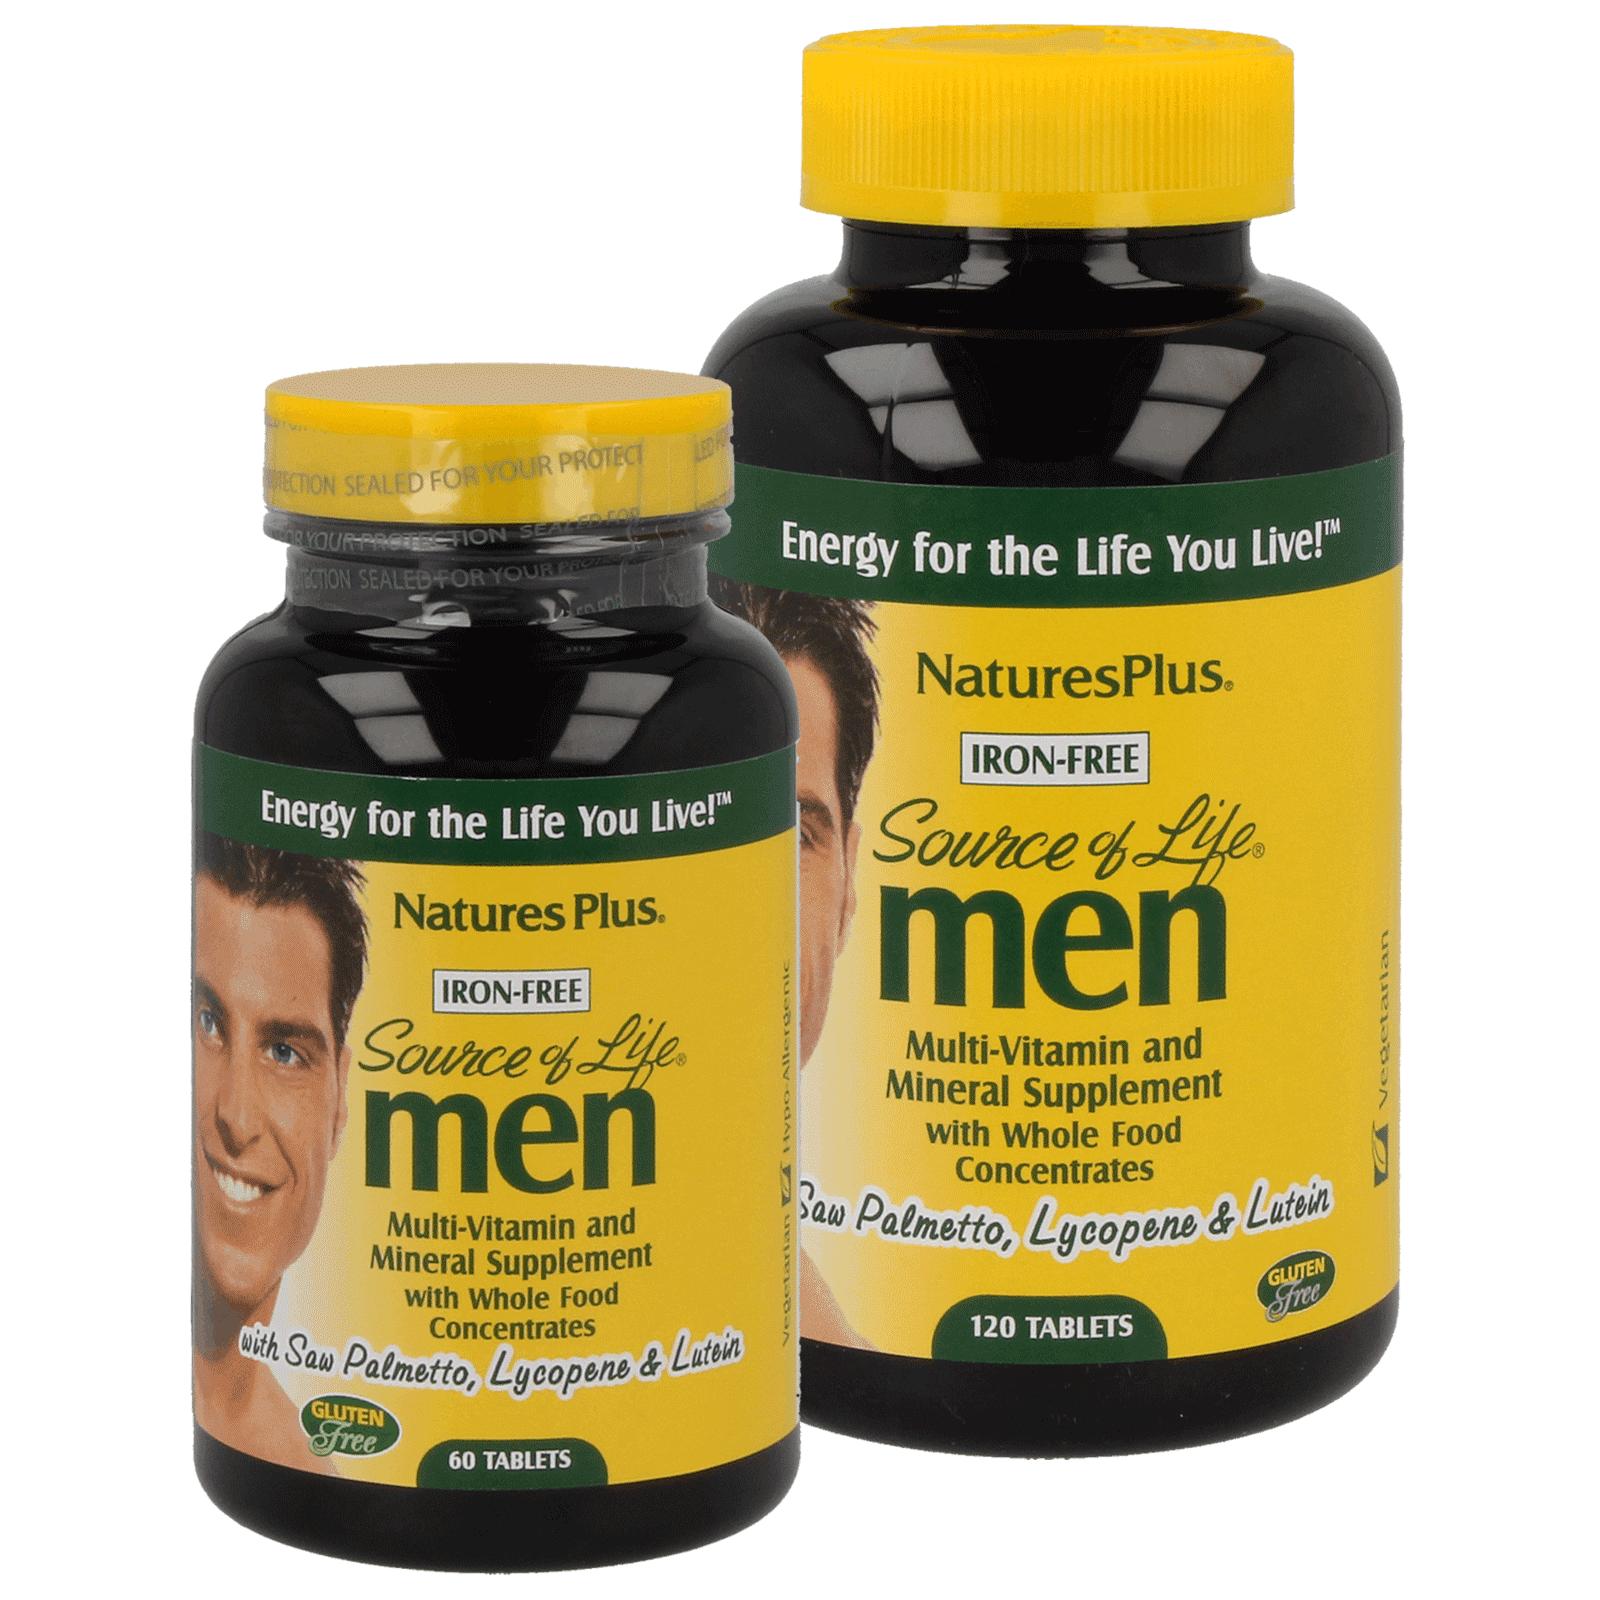 Source of Life® Men